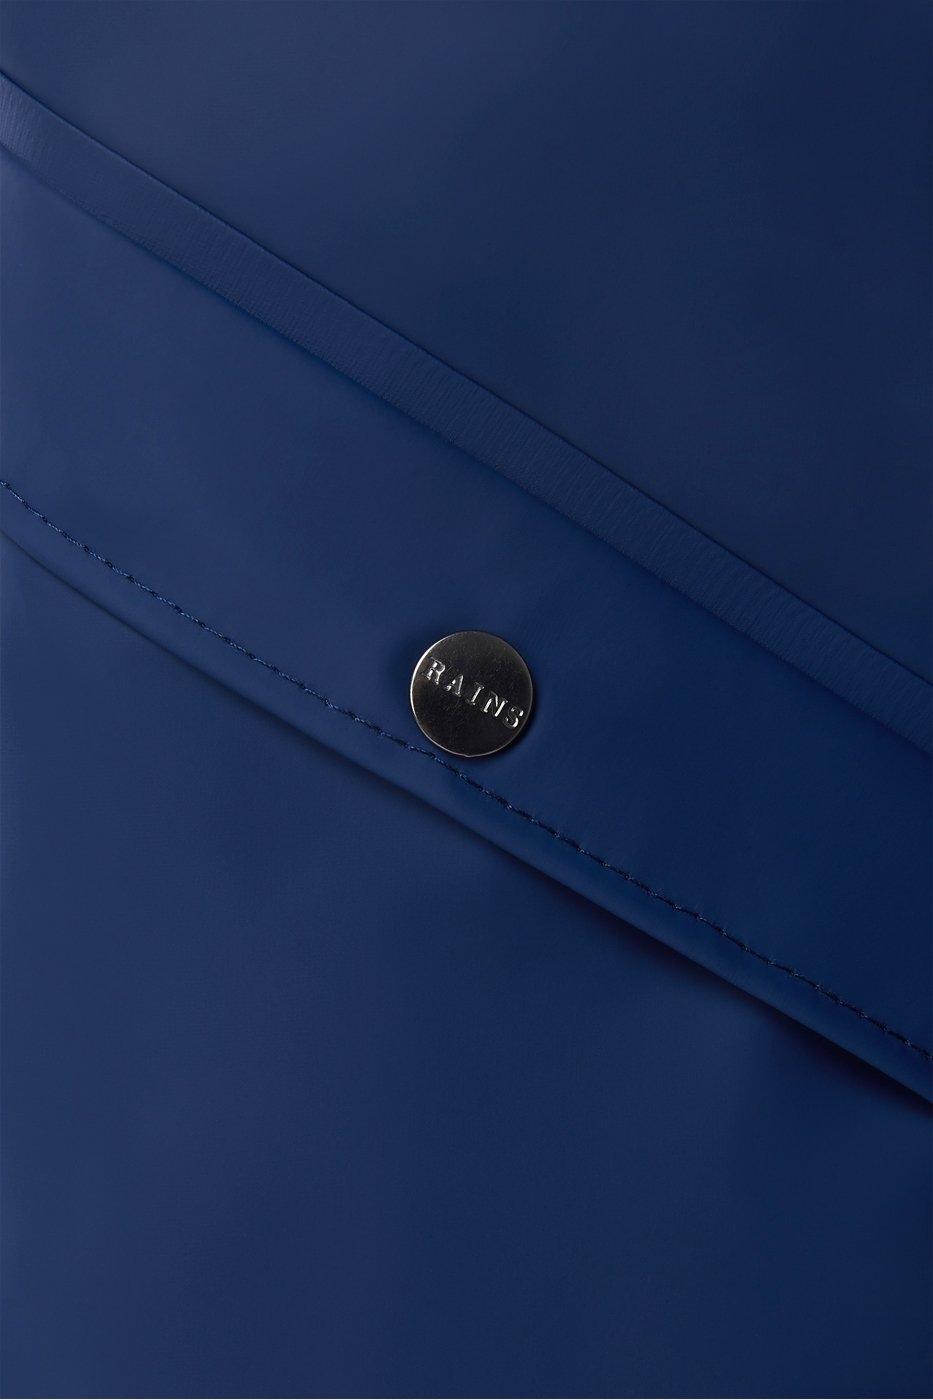 Rains Long Jacket true blue unisex XS/S